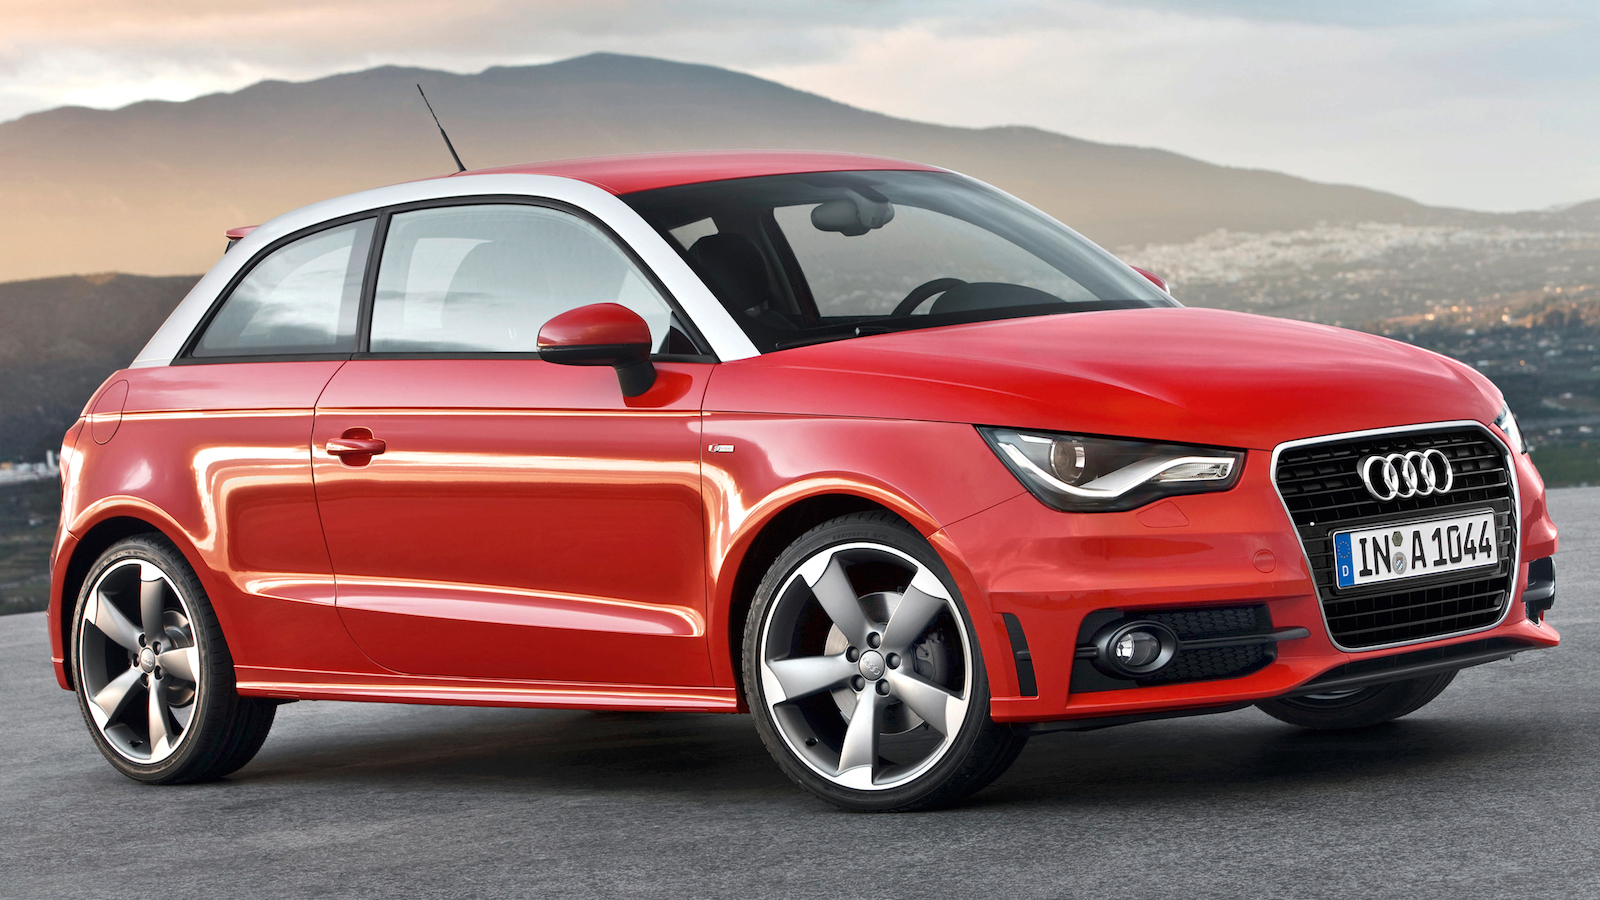 2010-Audi_A1-1